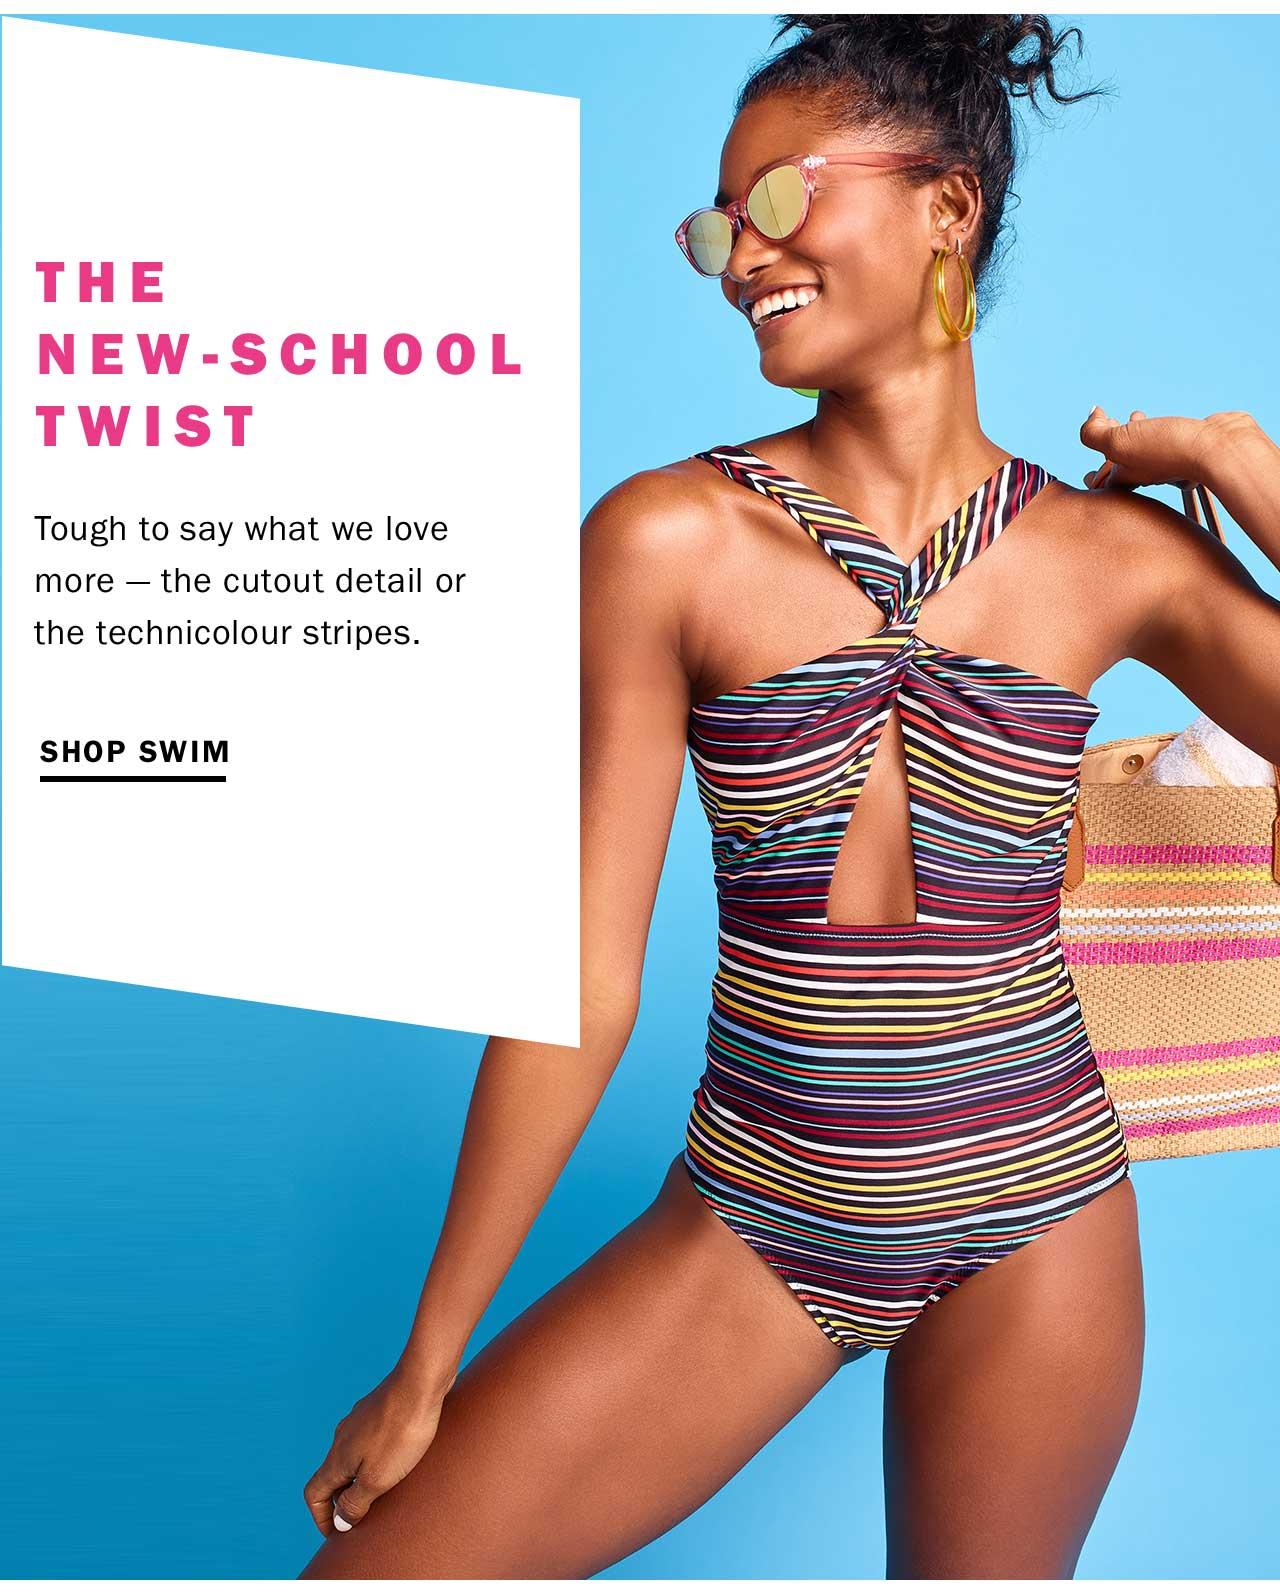 THE NEW-SCHOOL TWIST